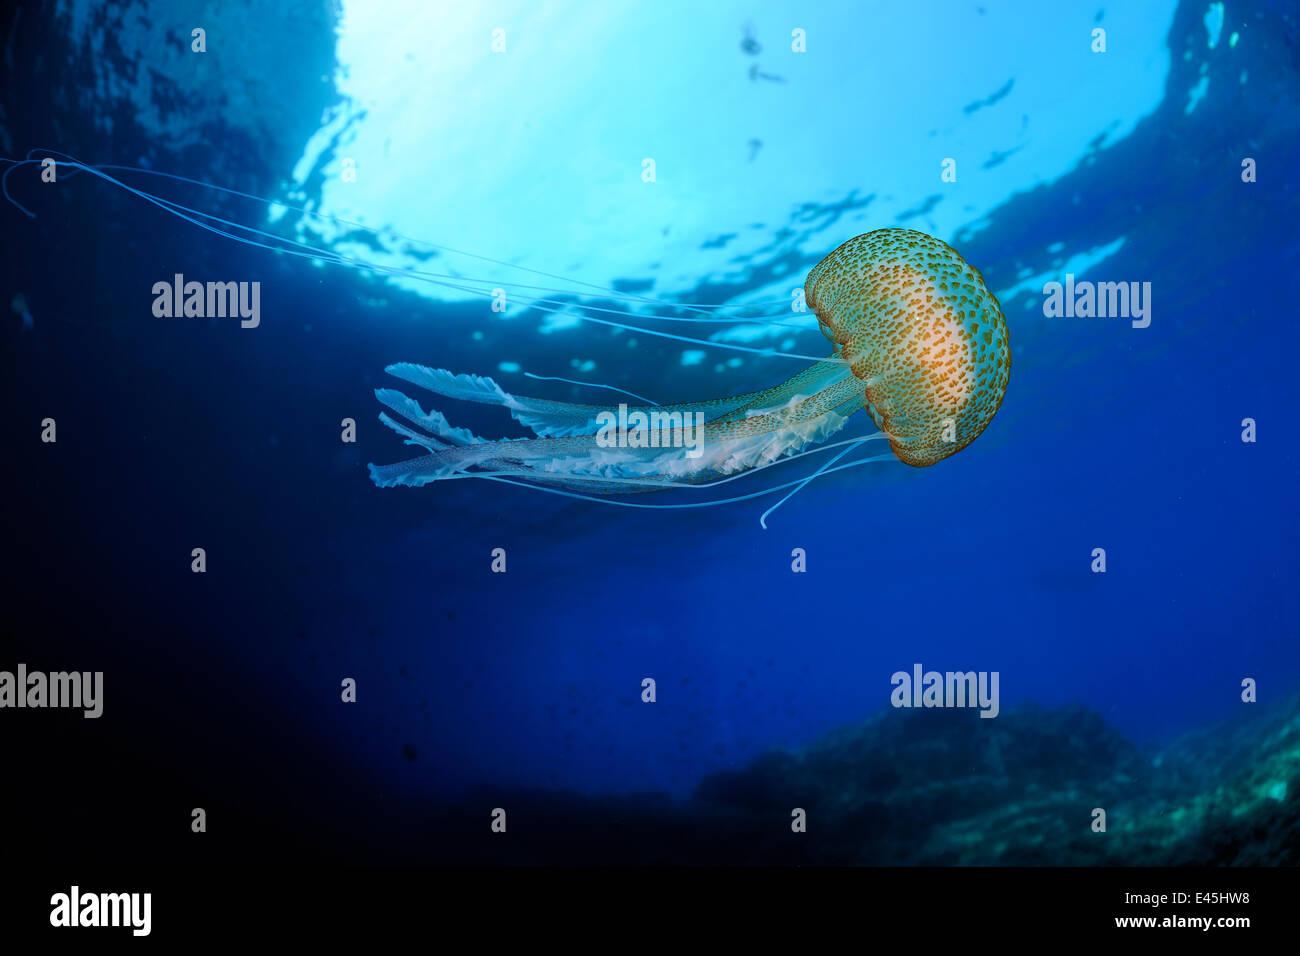 Purple stinger / Common jellyfish (Pelagia noctiluca) Malta, Mediteranean, May 2009 - Stock Image